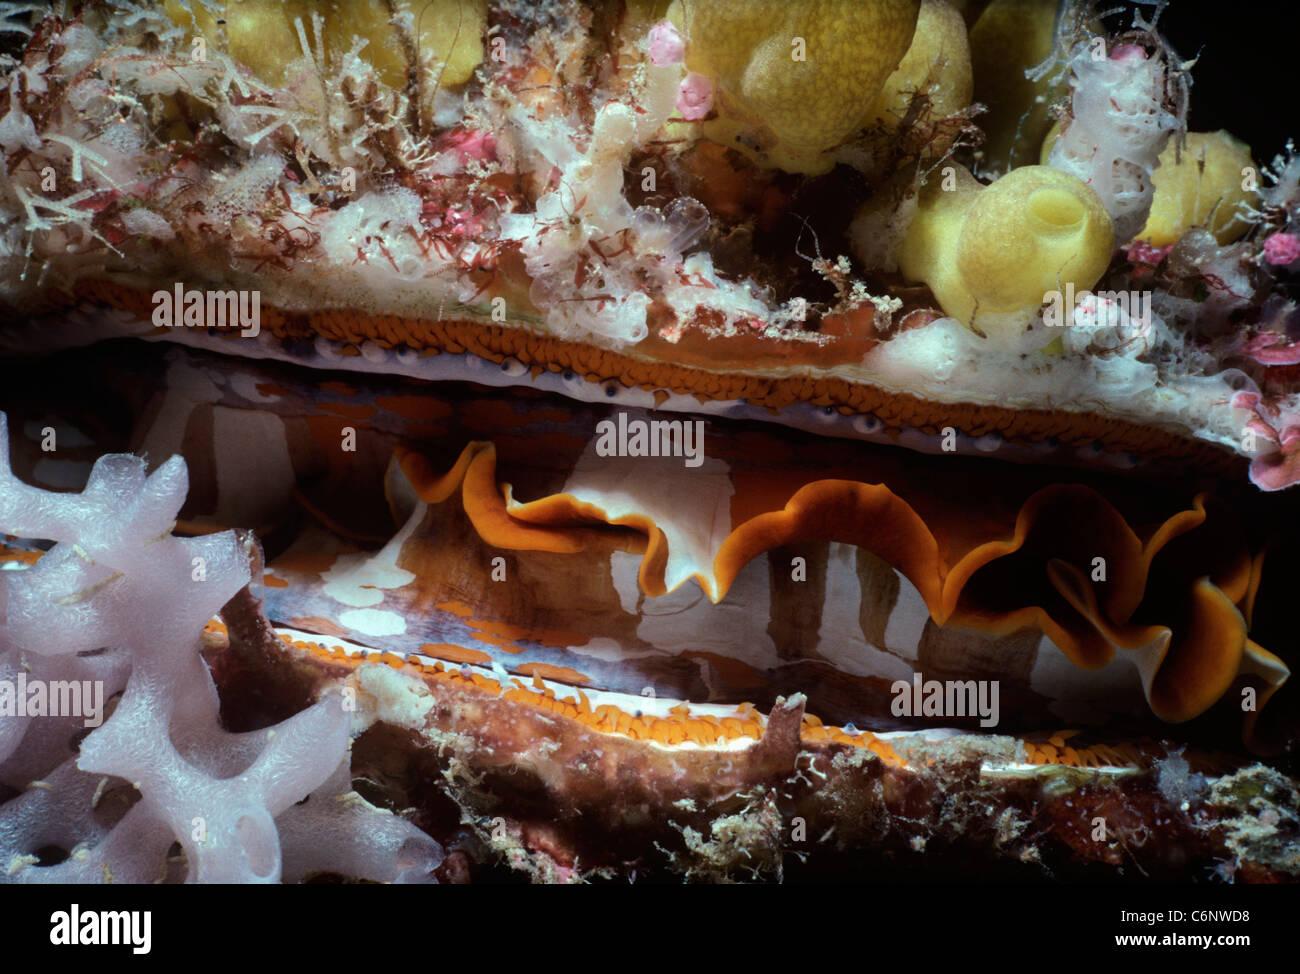 Thorny Oyster (Spondylus varius) (mantle) filter-feeding at night. Sipadan Island, Borneo - South China Sea - Stock Image